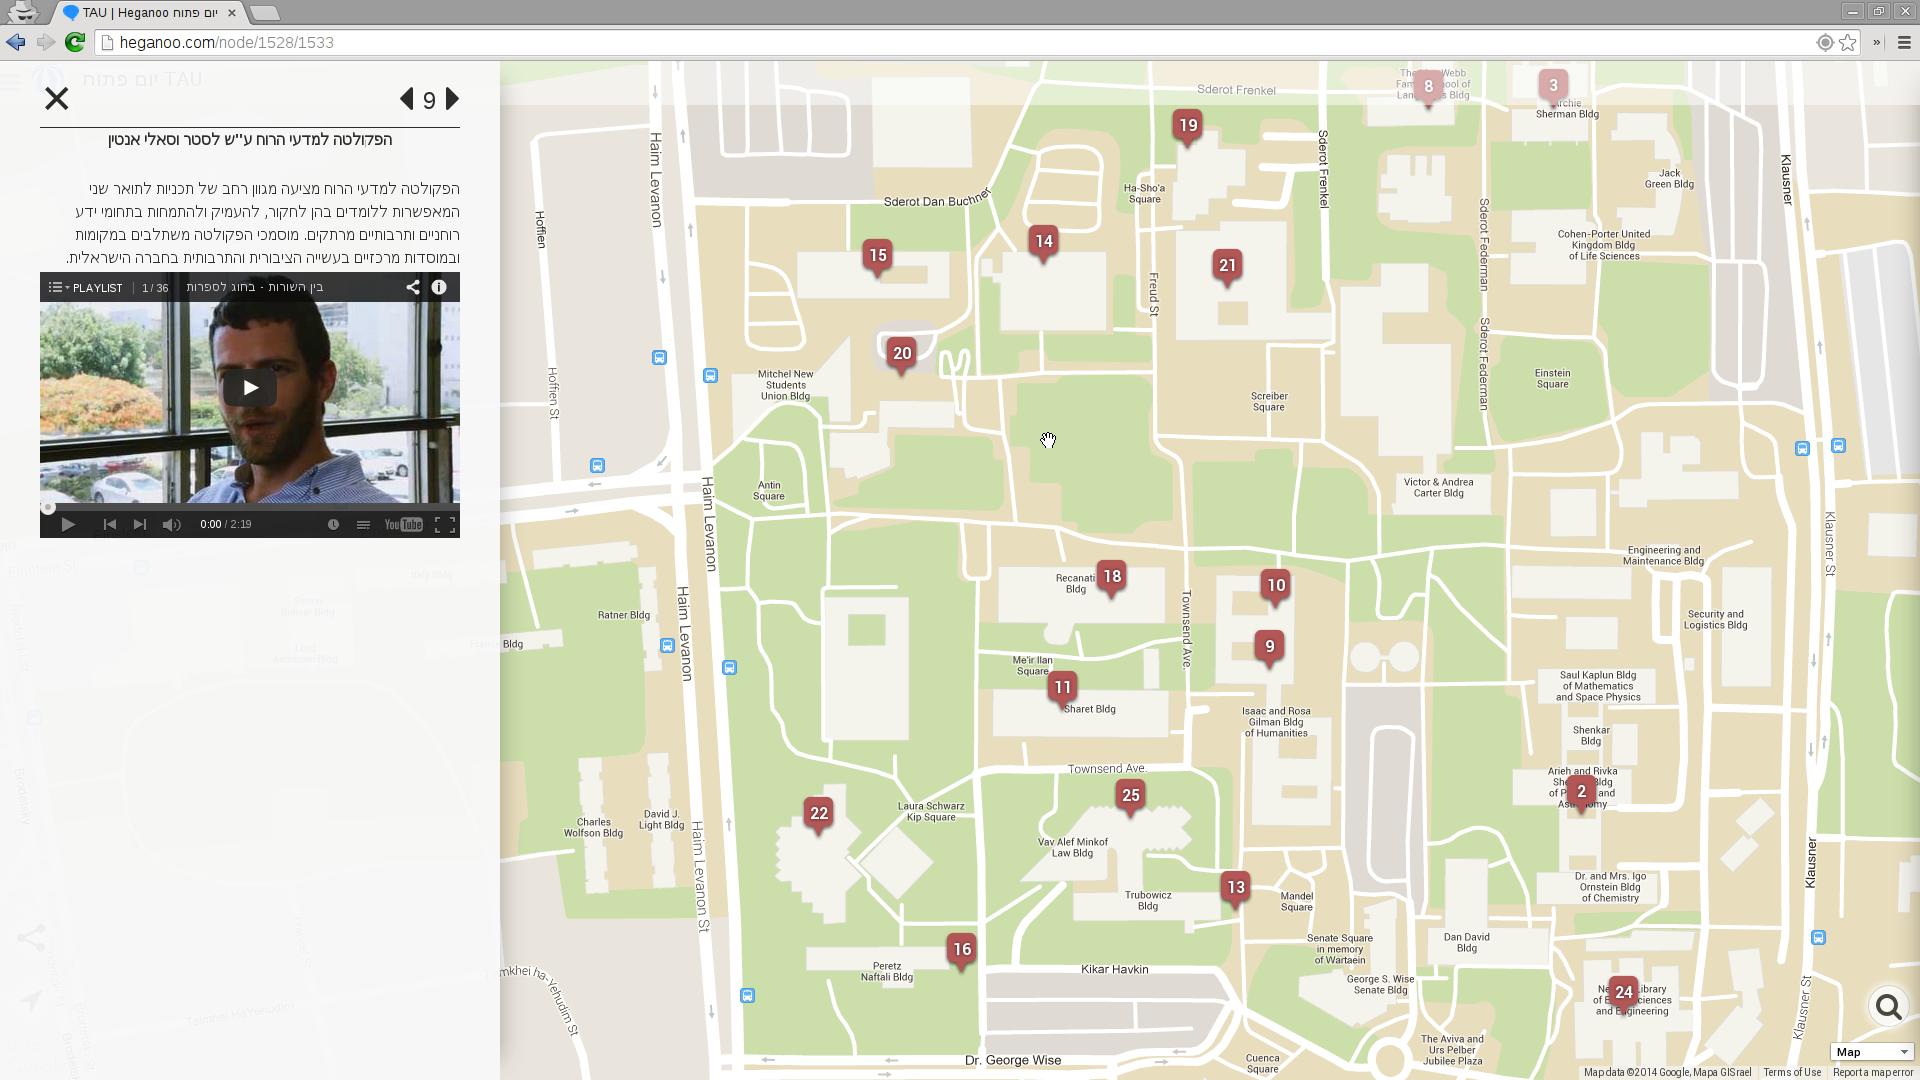 tel aviv university campus map Tel Aviv University Open Day Map Stays Relevant Throughout The tel aviv university campus map